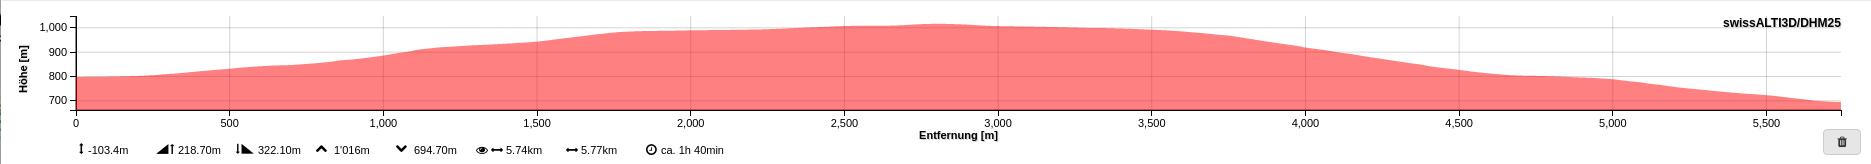 Hoehenprofil Farnern-Stierenberg-Rumisberg